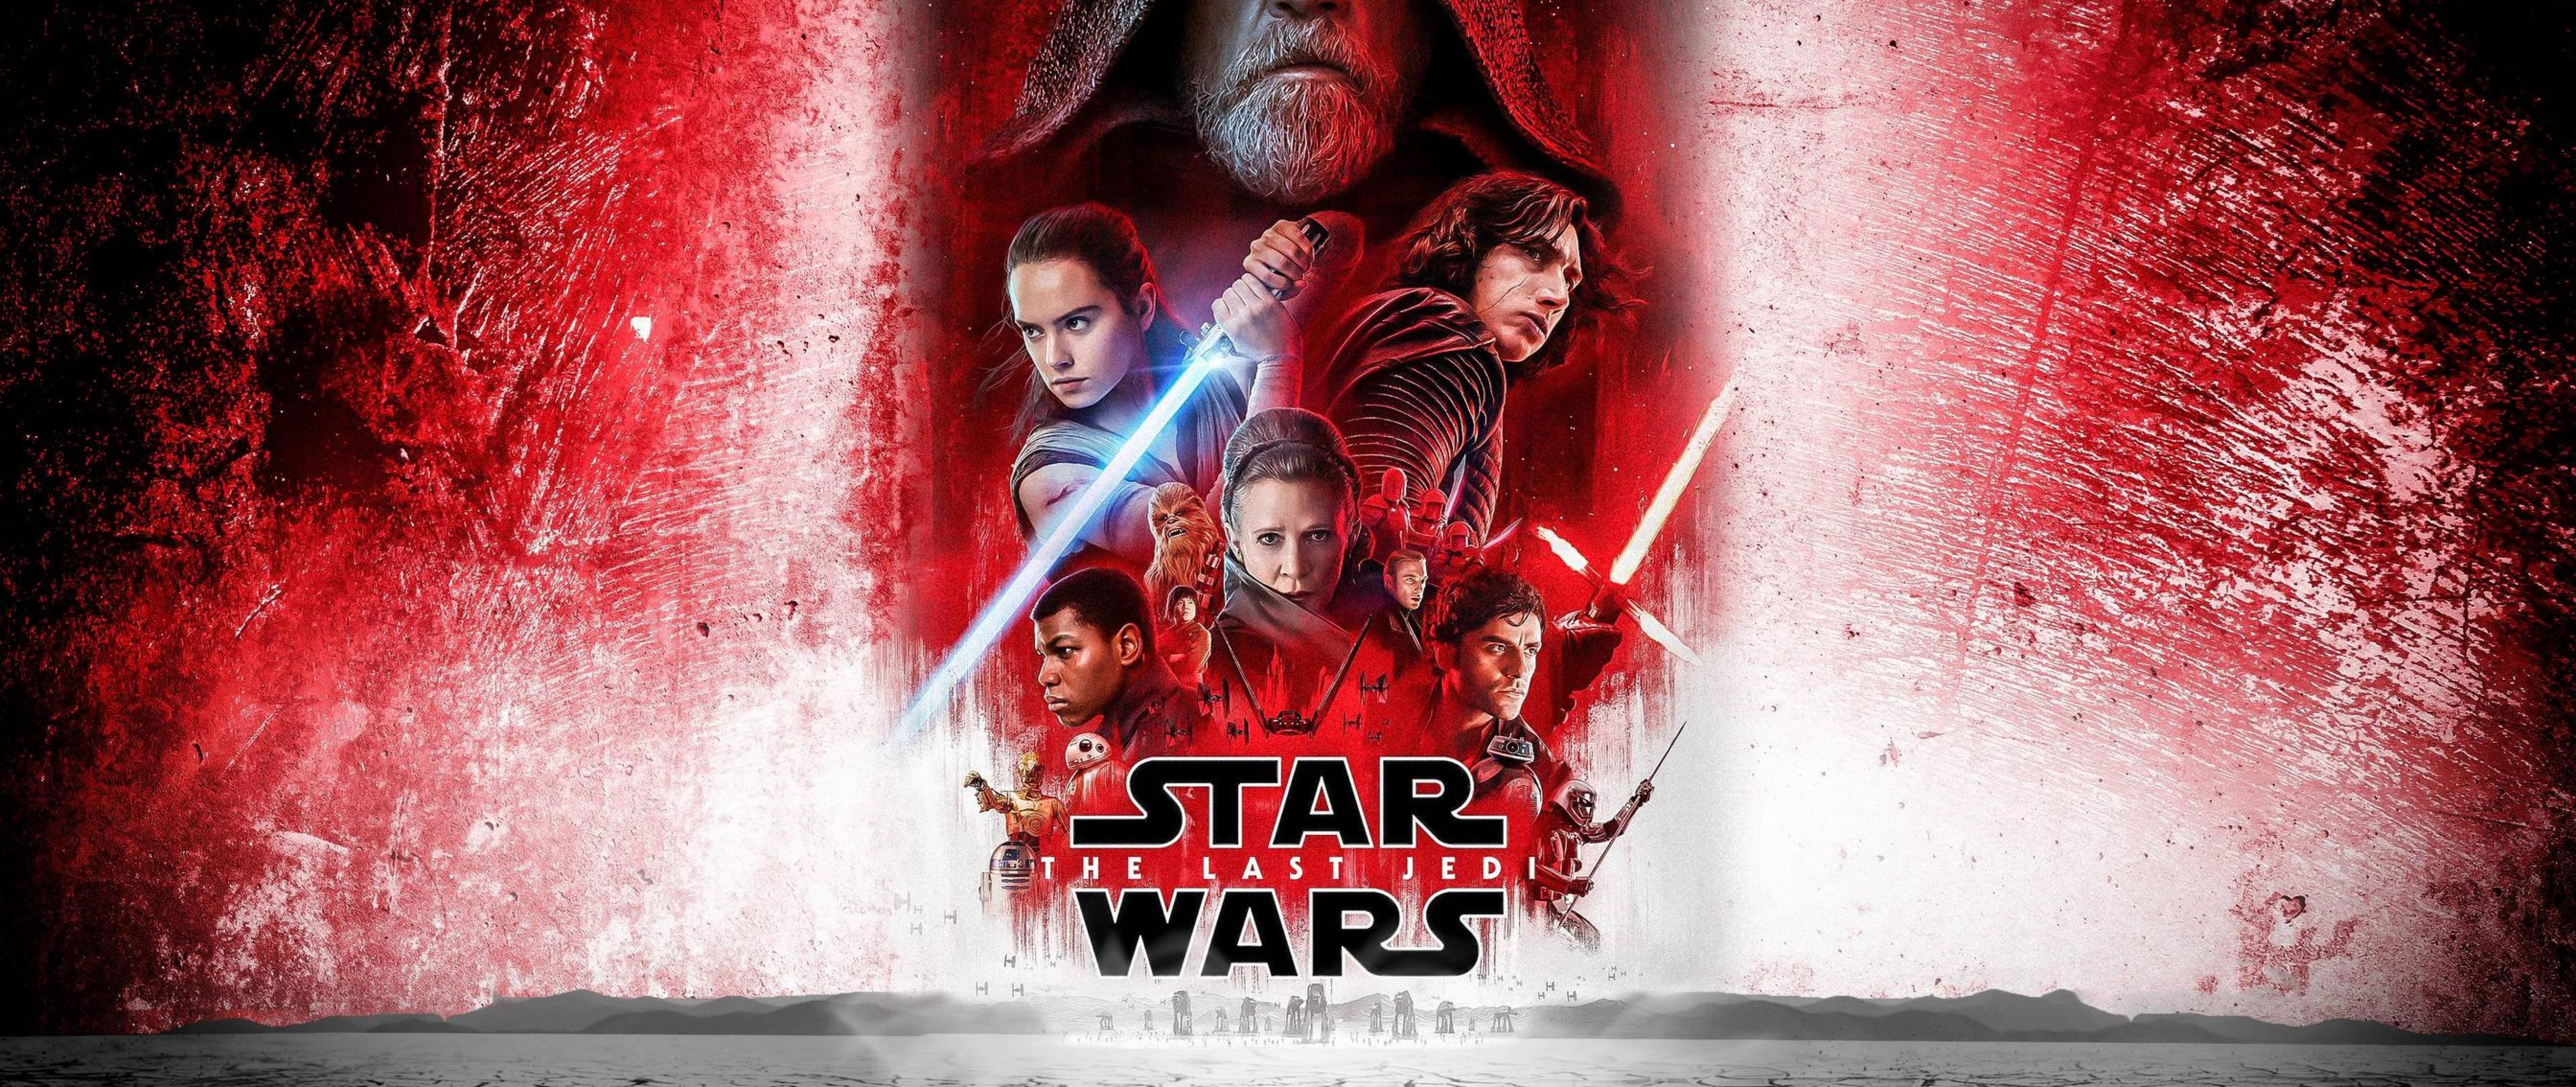 Free Download Star Wars The Last Jedi Hd Wallpaper For